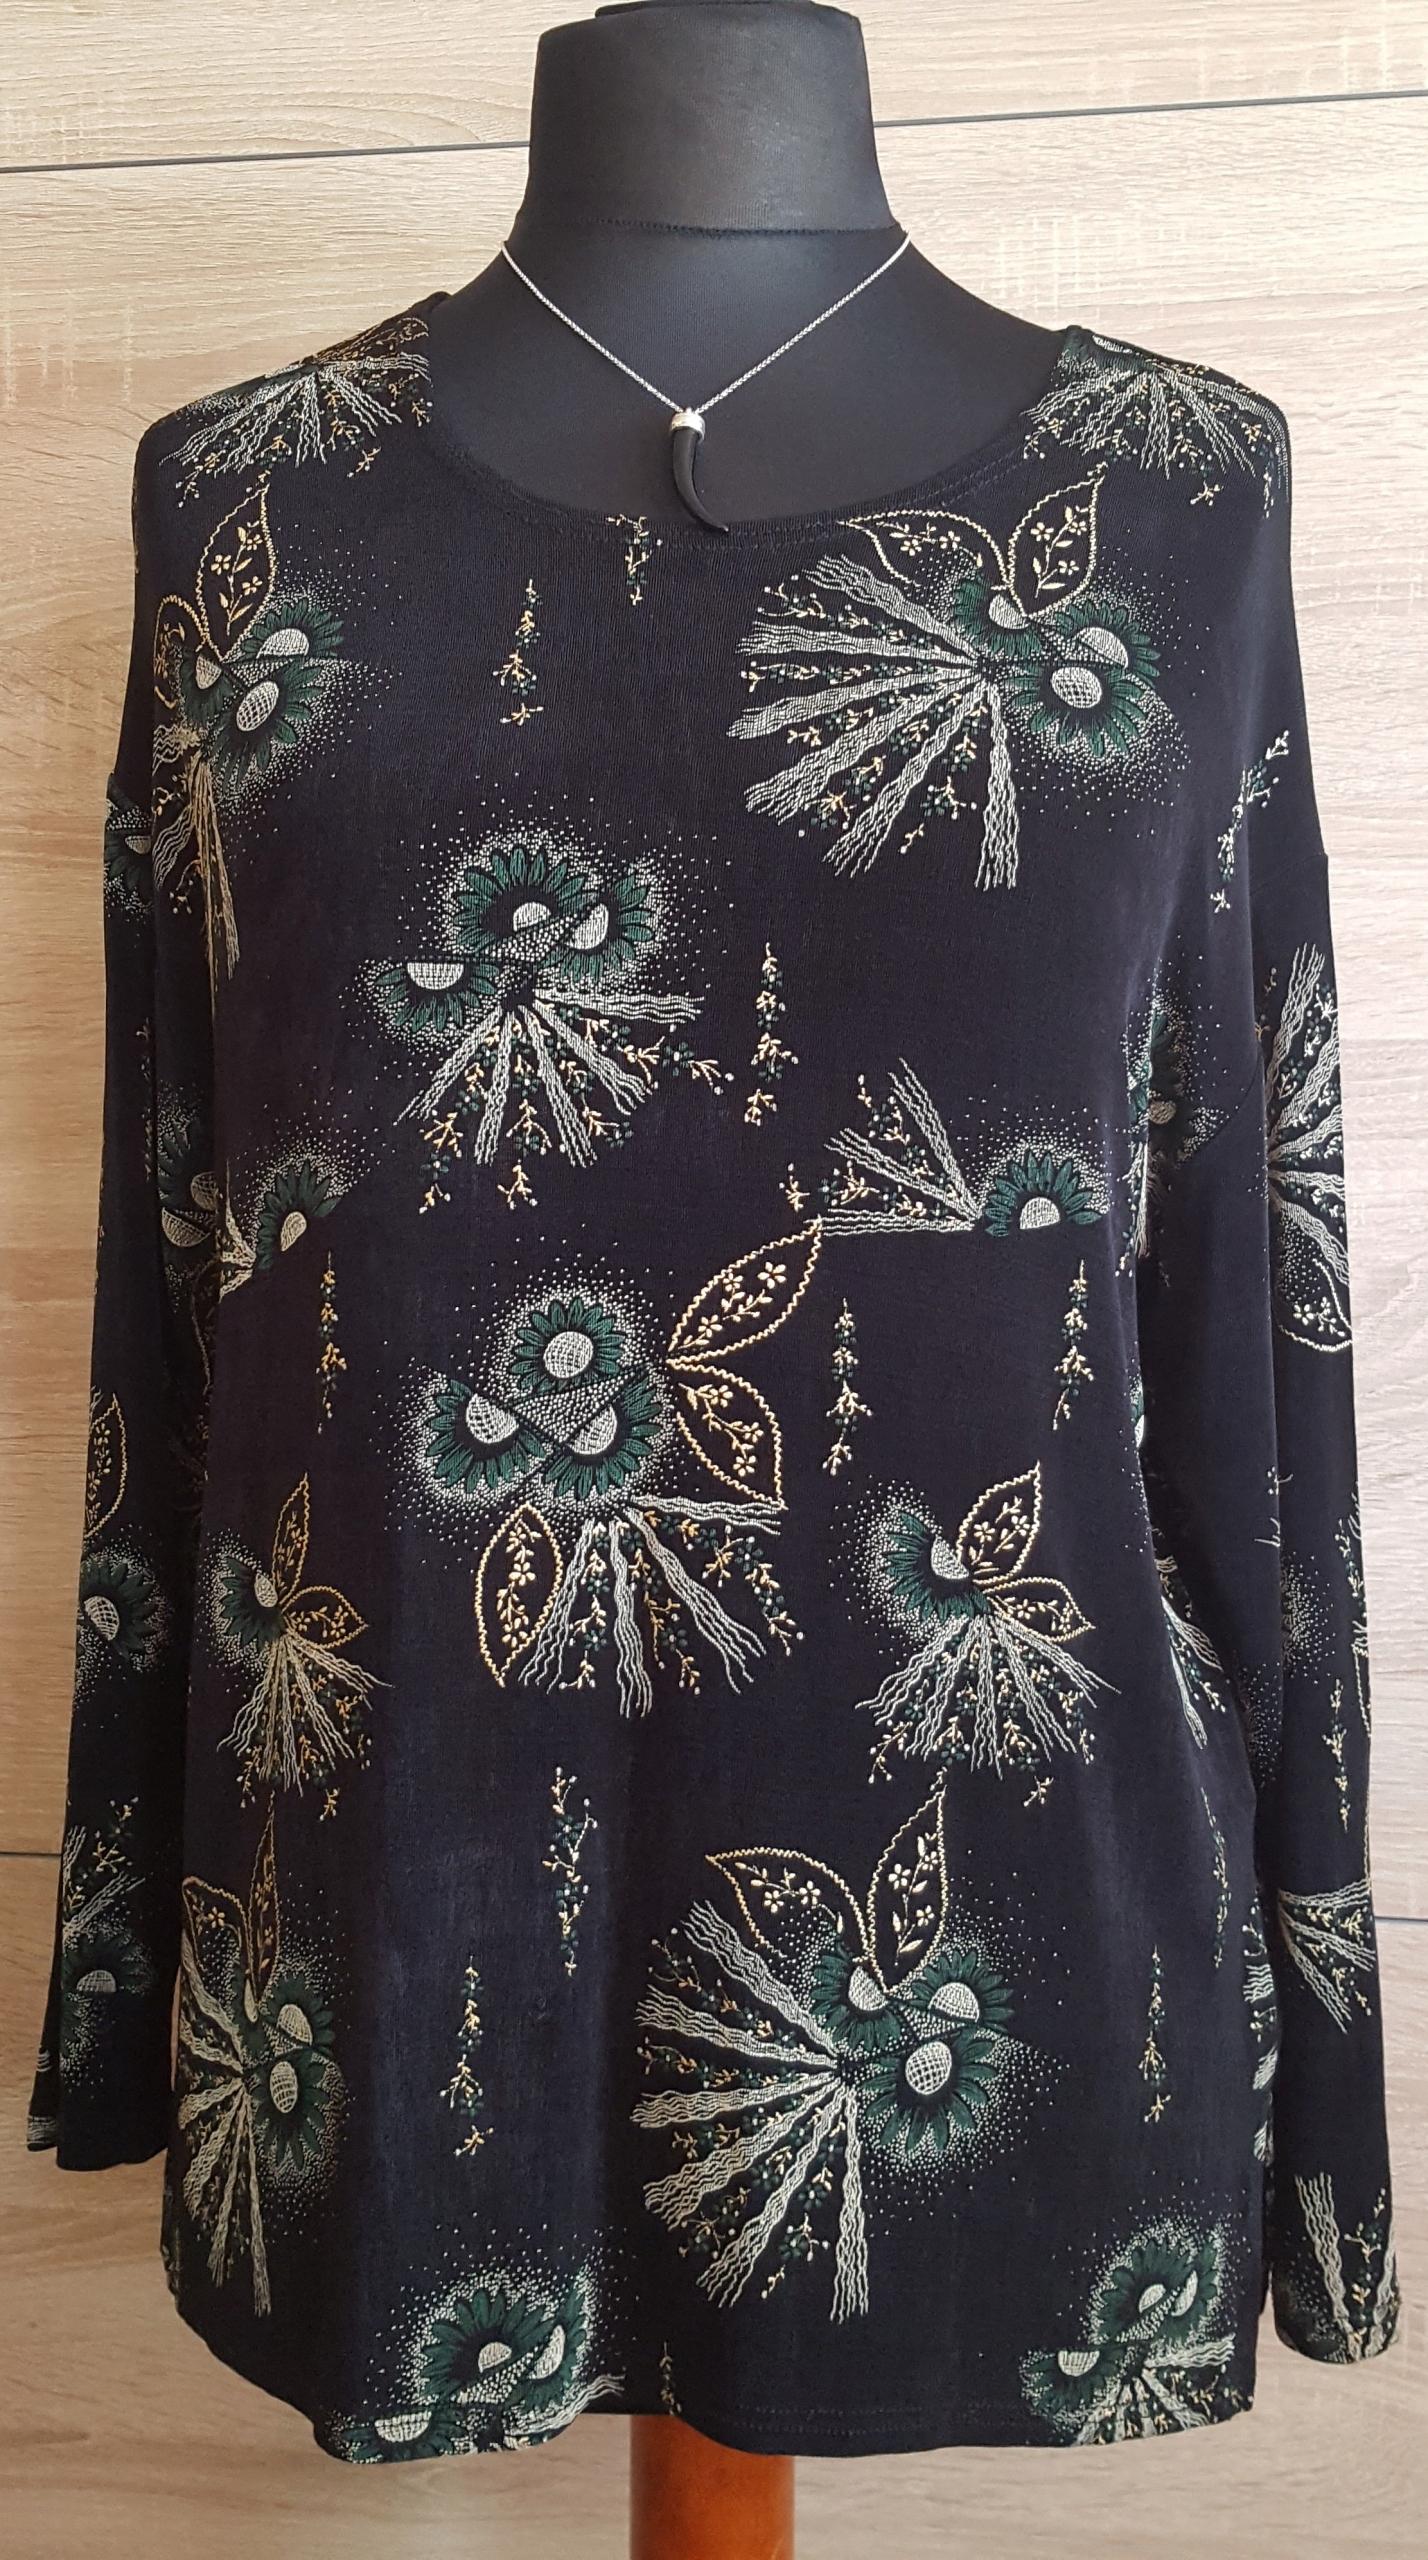 Bluzka damska duży rozmiar 48.